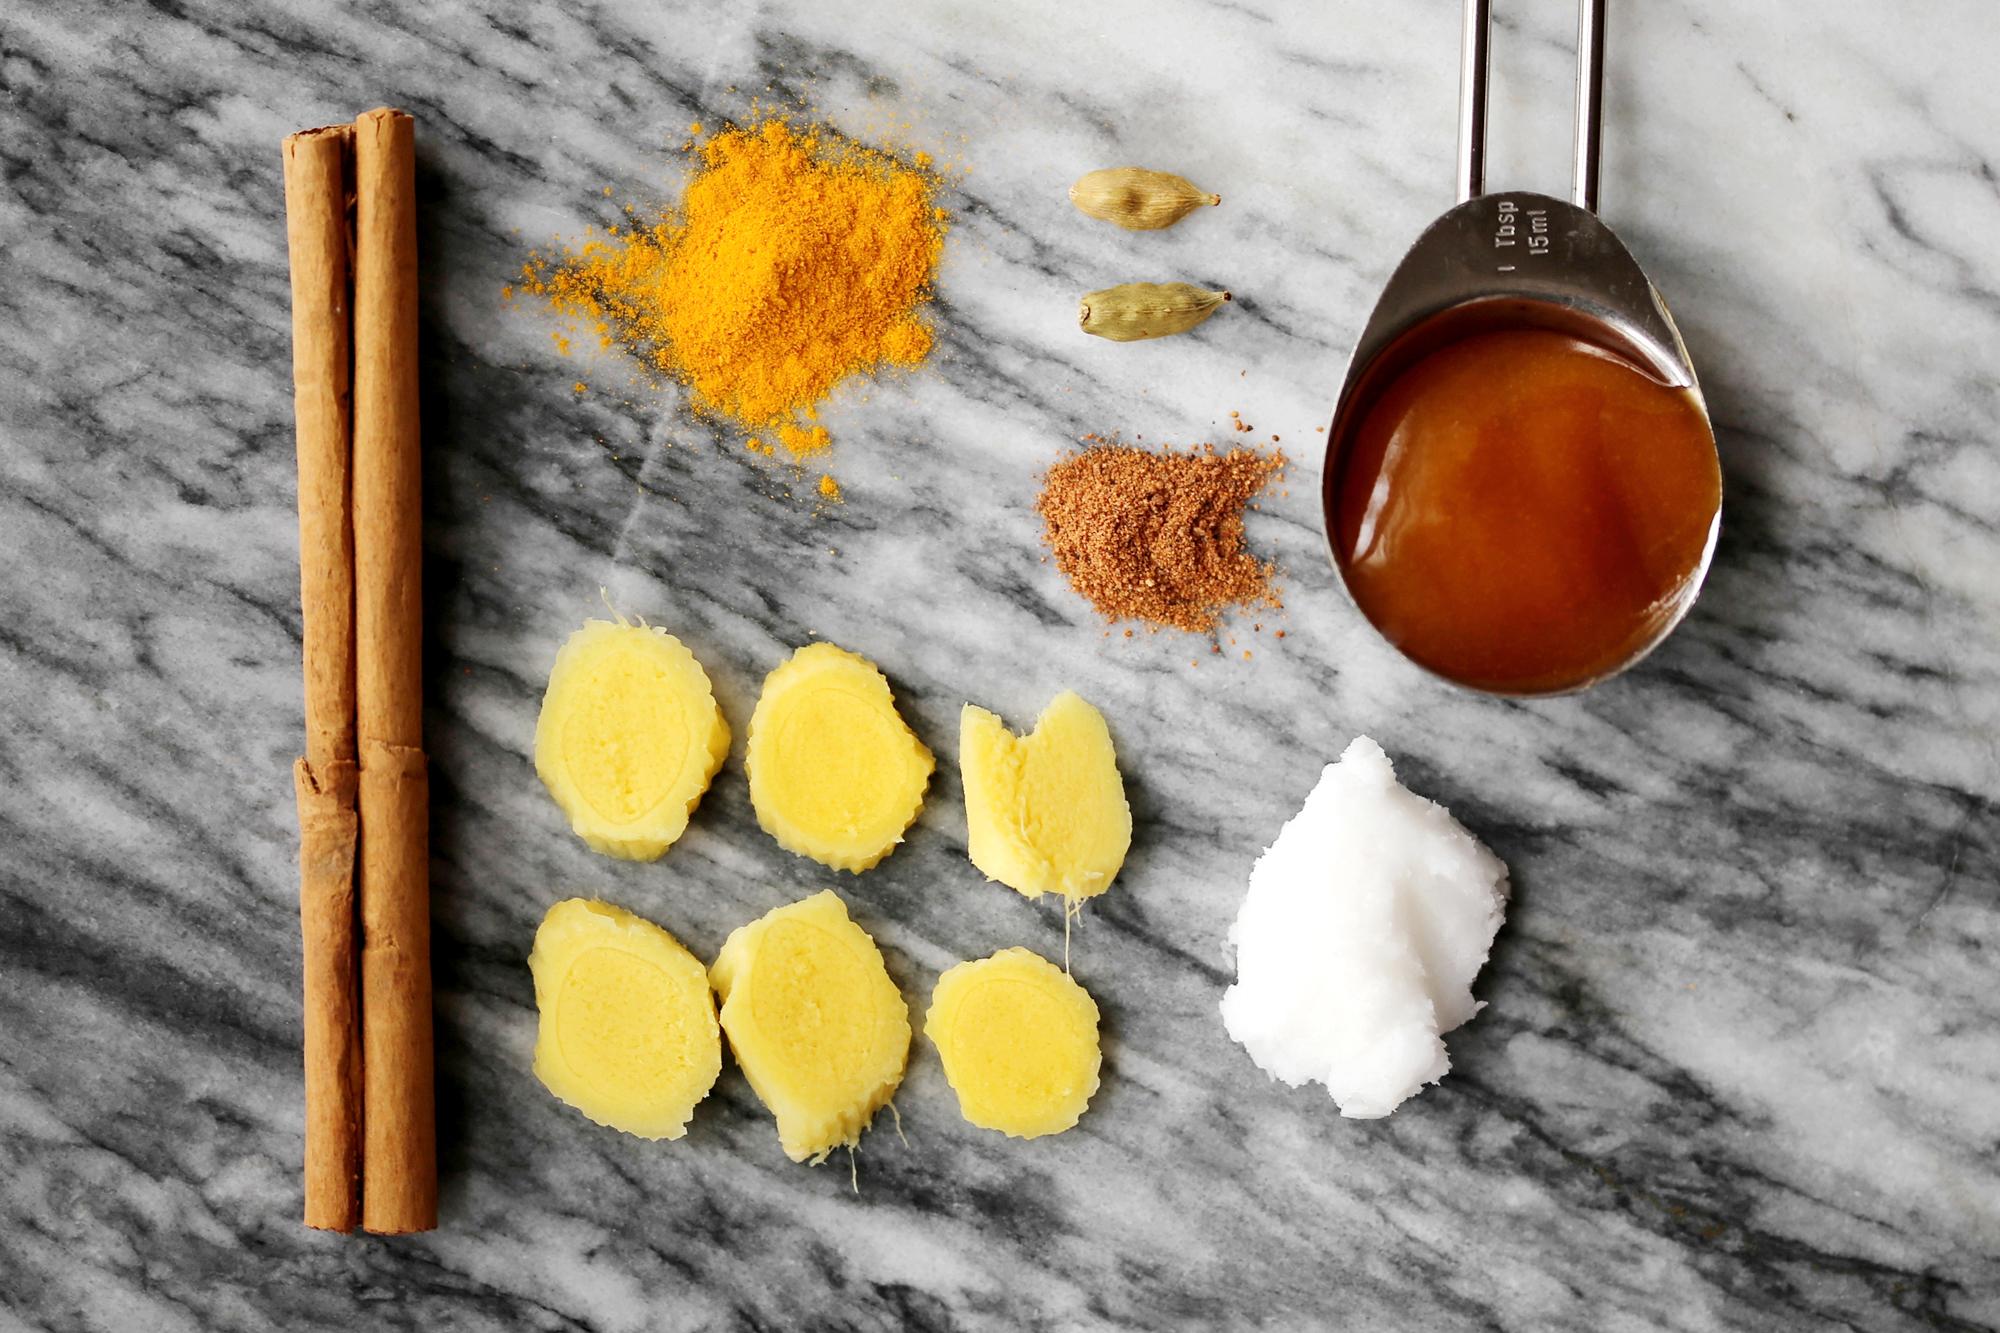 RECIPE: Ginger, Turmeric & Cardamom Latte with Manuka Honey